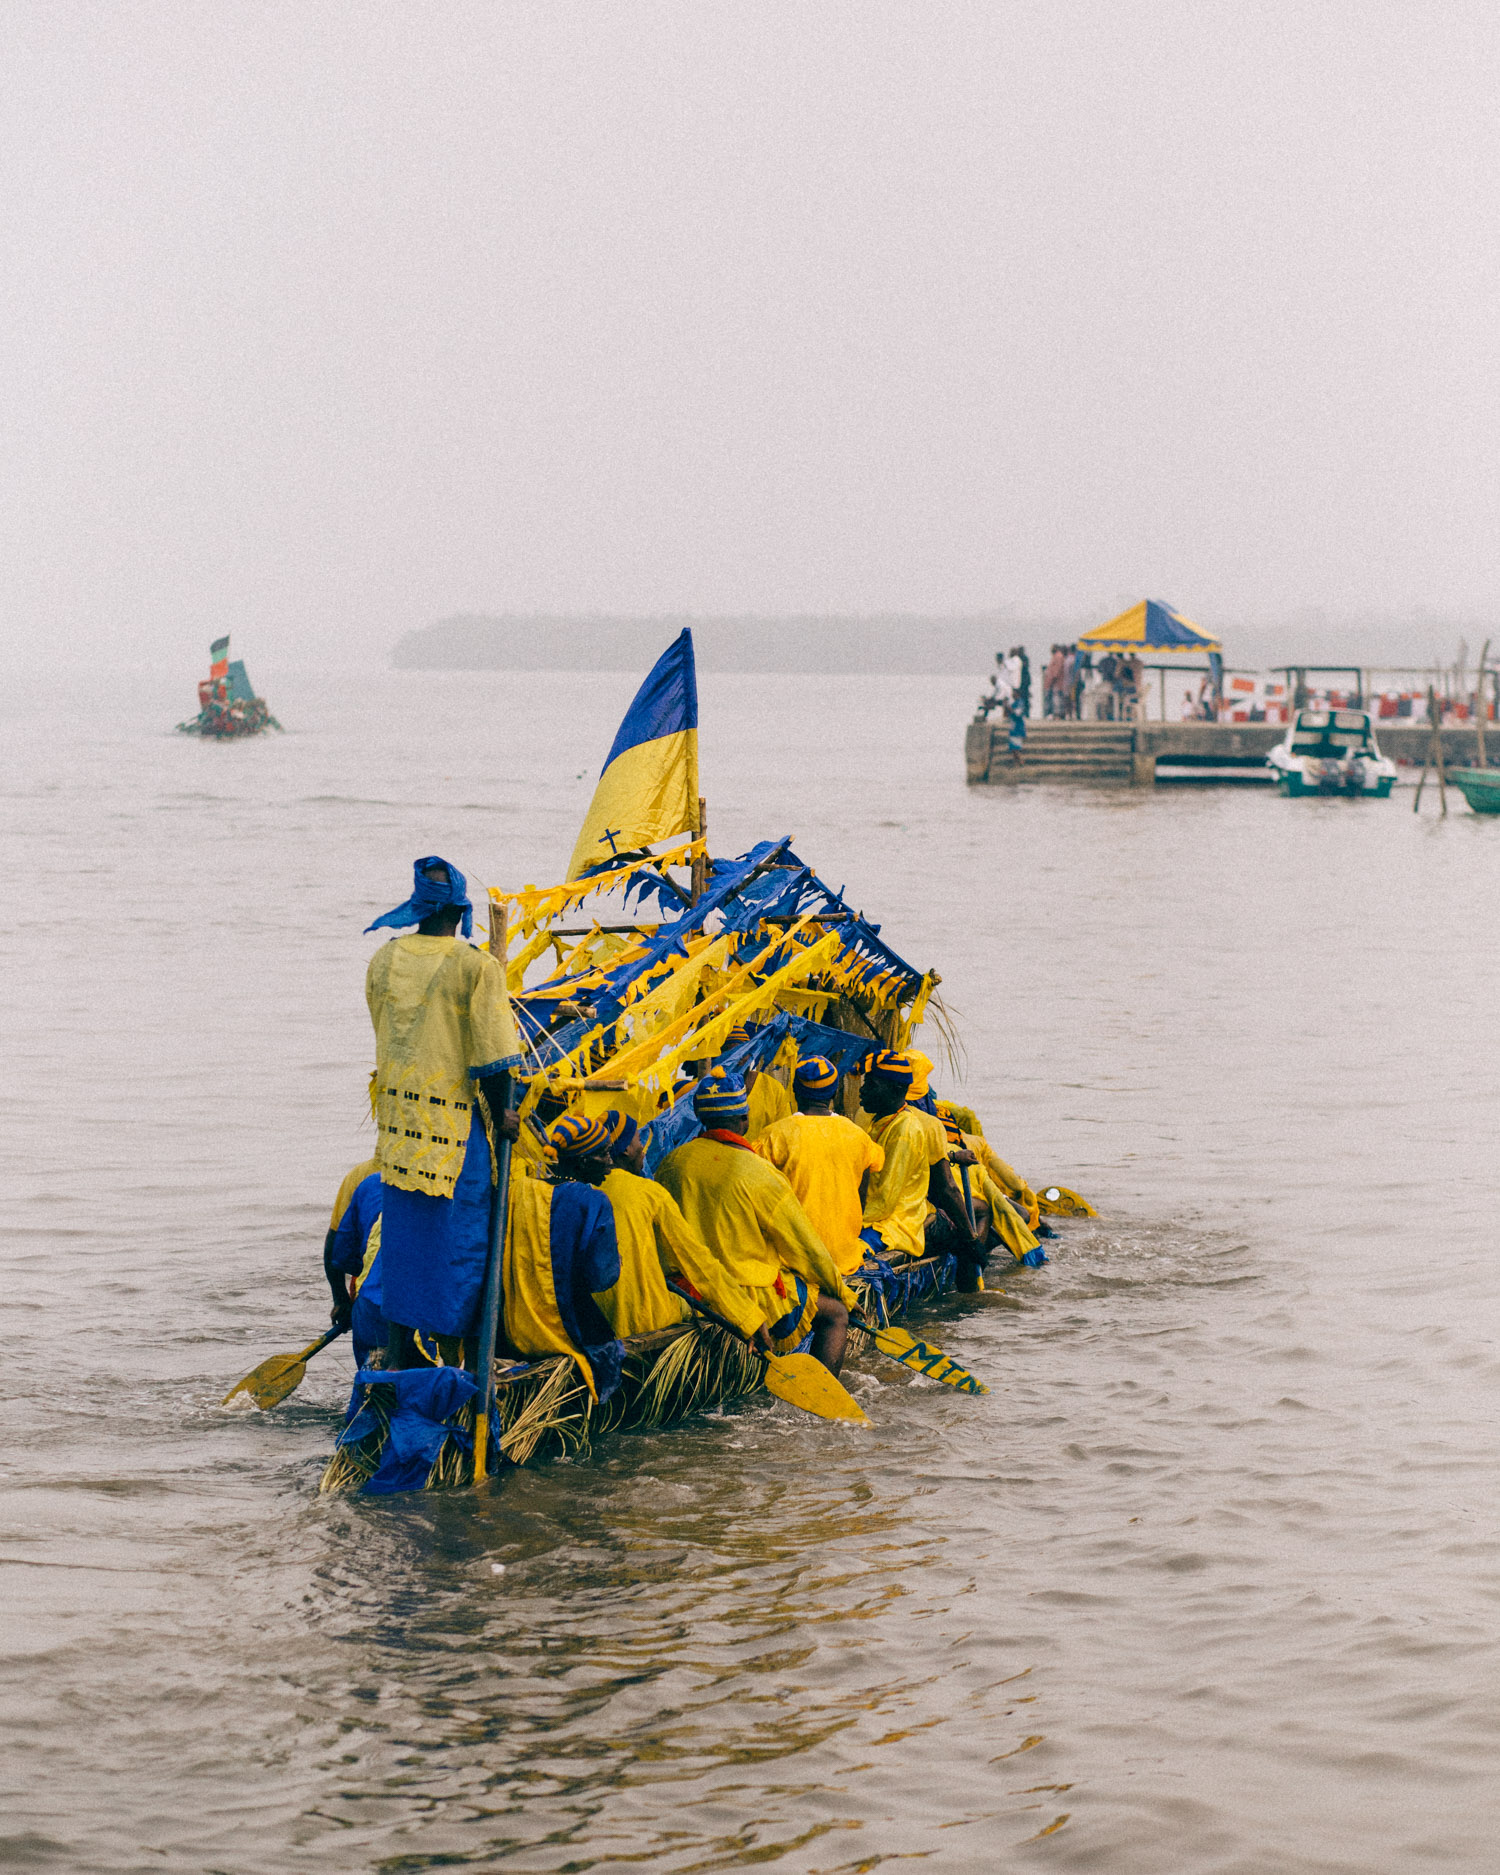 Men Rowing, Opobo Boat Regatta Festival